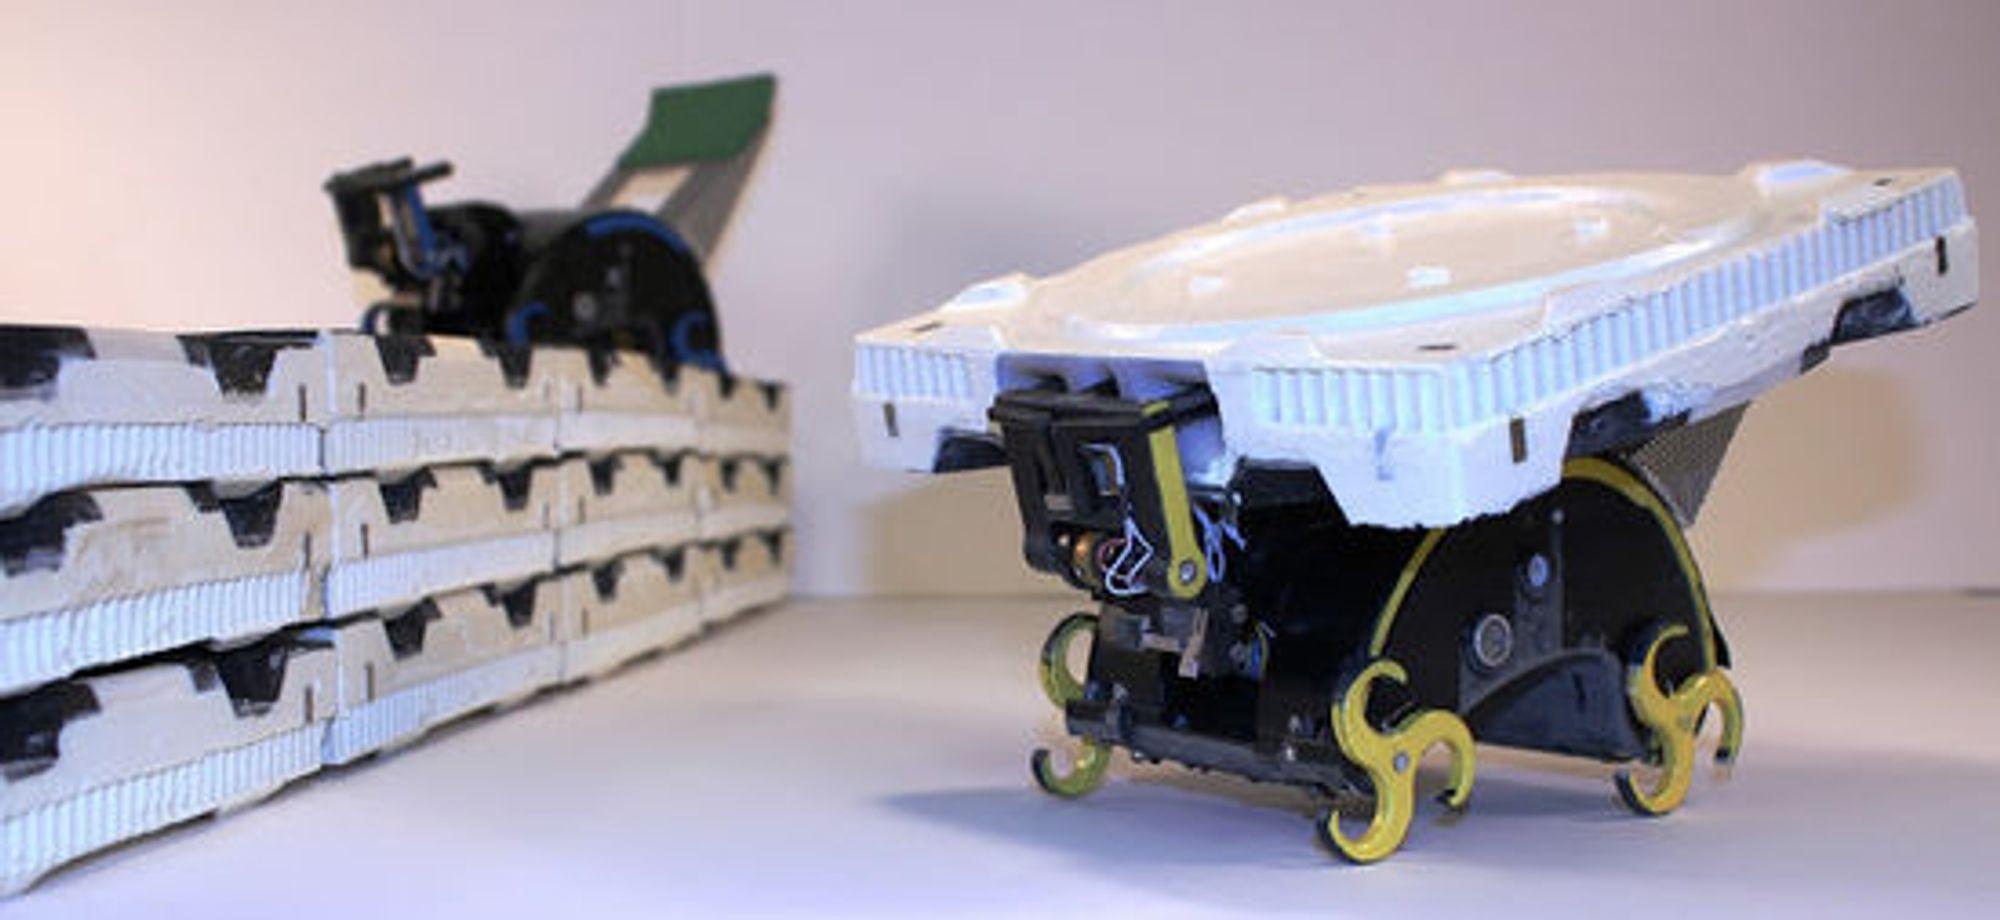 Roboten kan hente og plassere, men ikke fjerne en brikke.